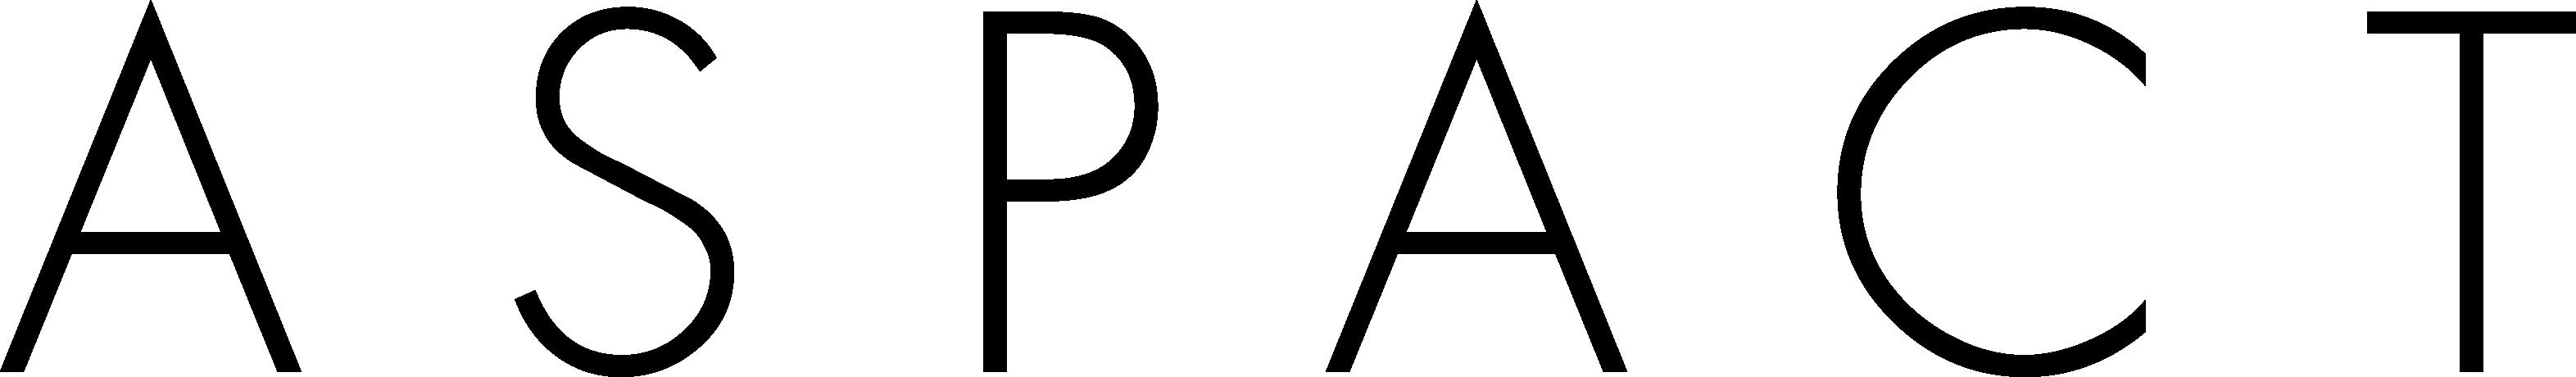 Aspact